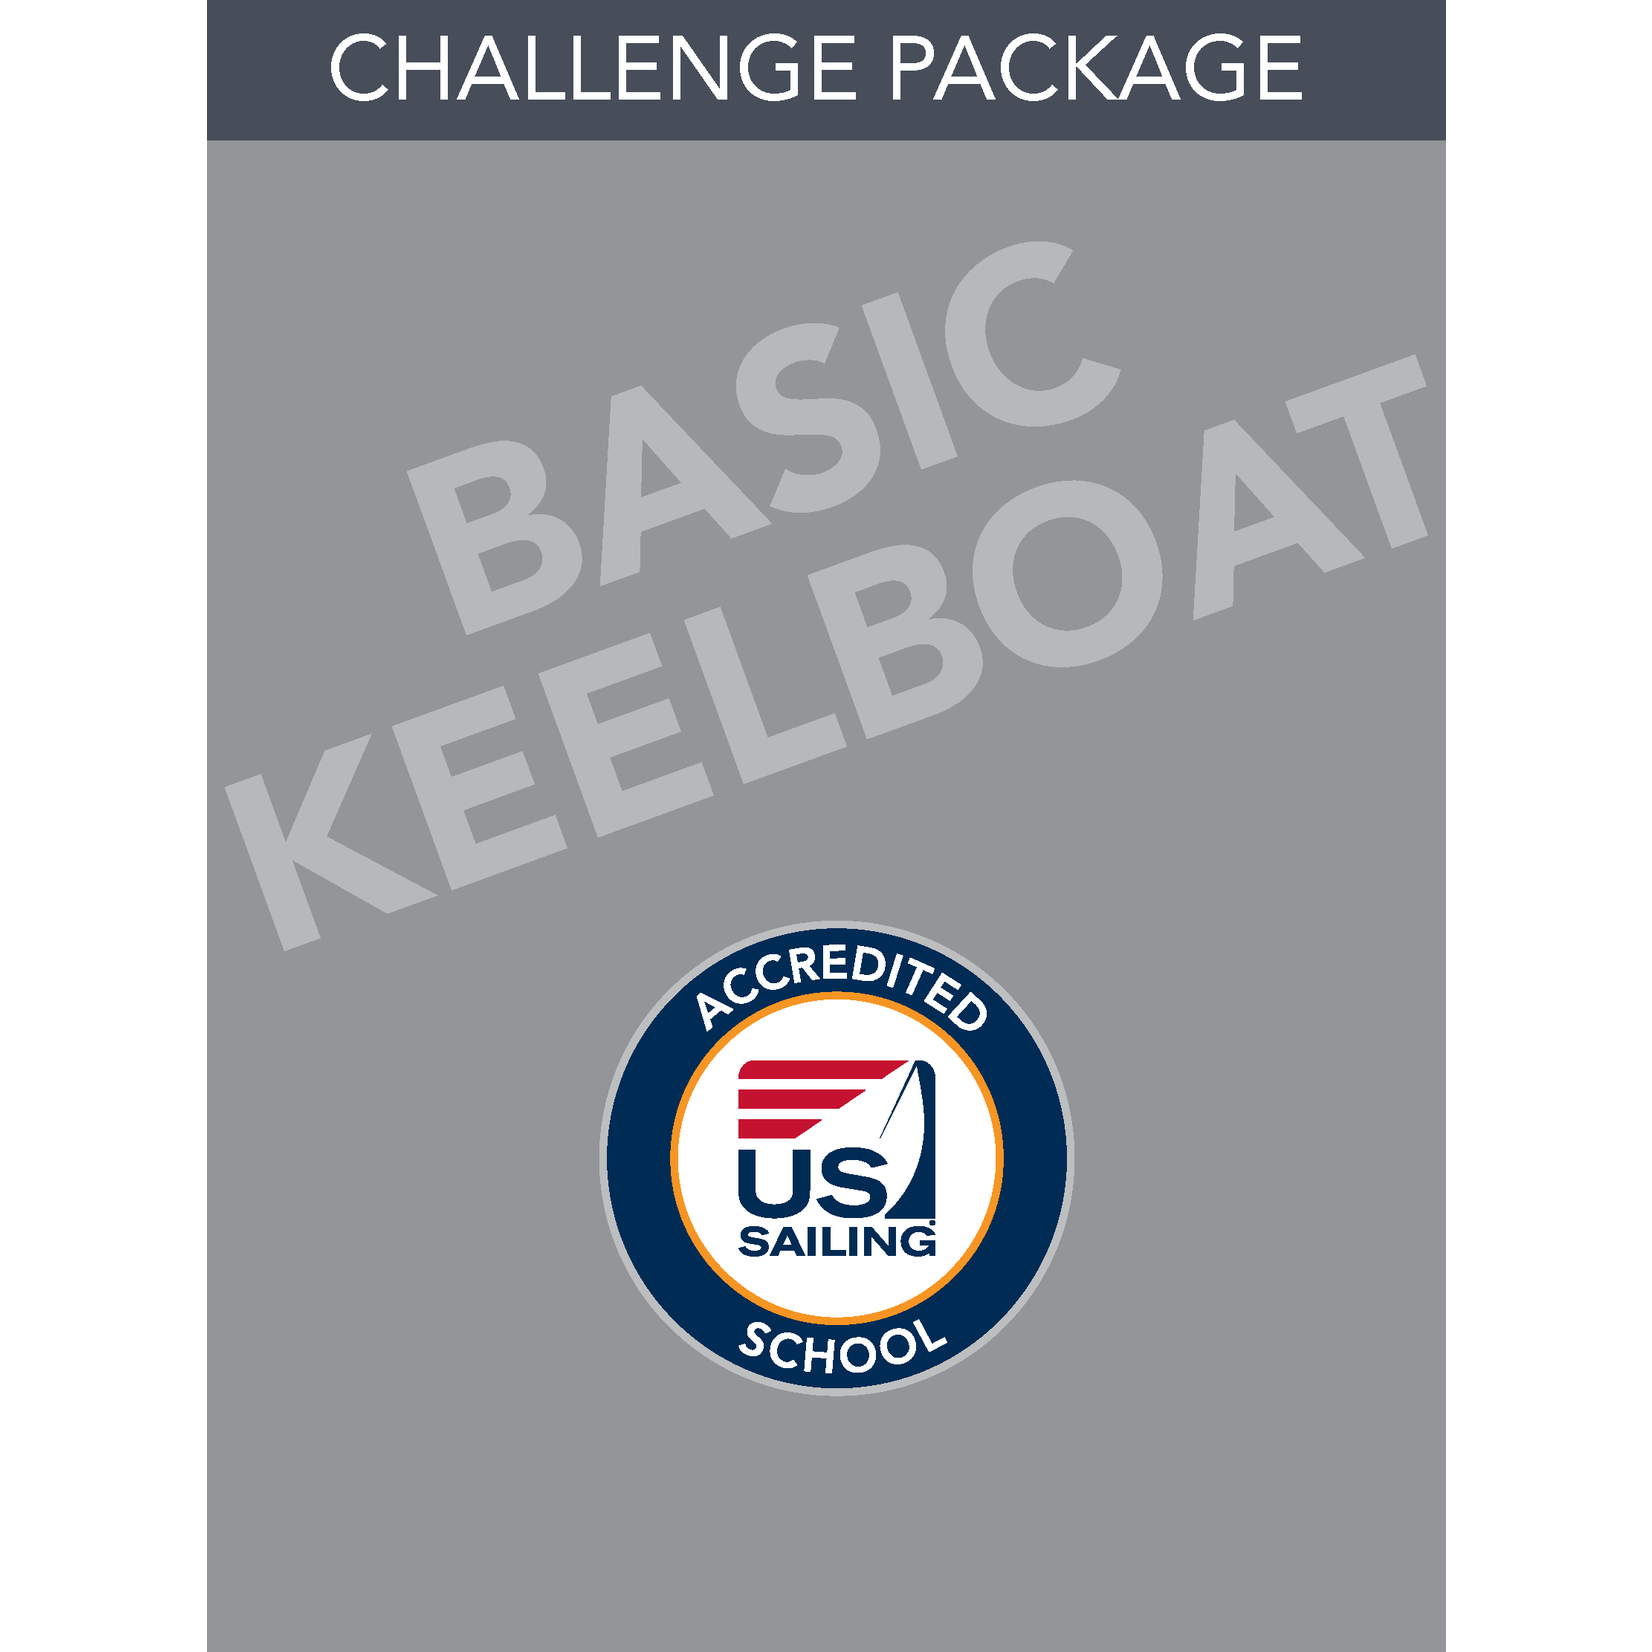 Basic Keelboat- Challenge Package